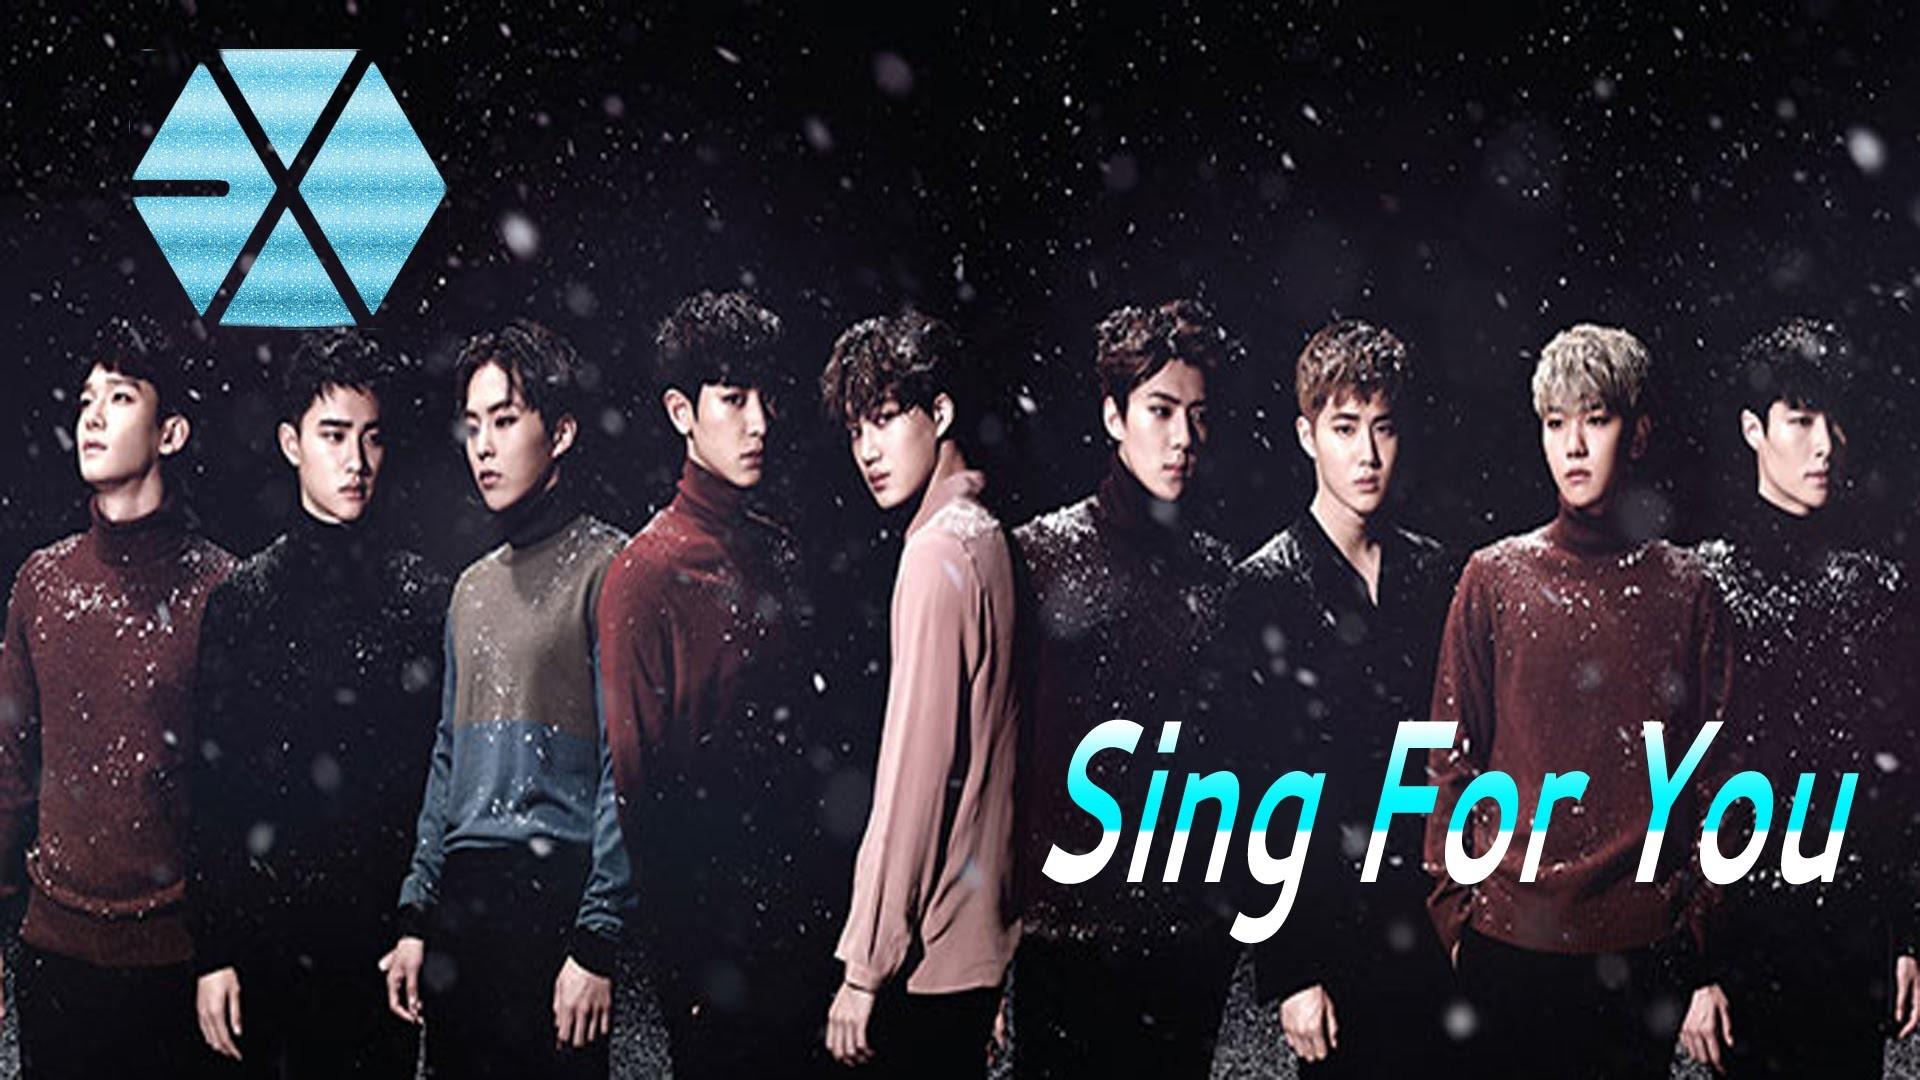 EXO – Sing For You [Chipmunks Version]